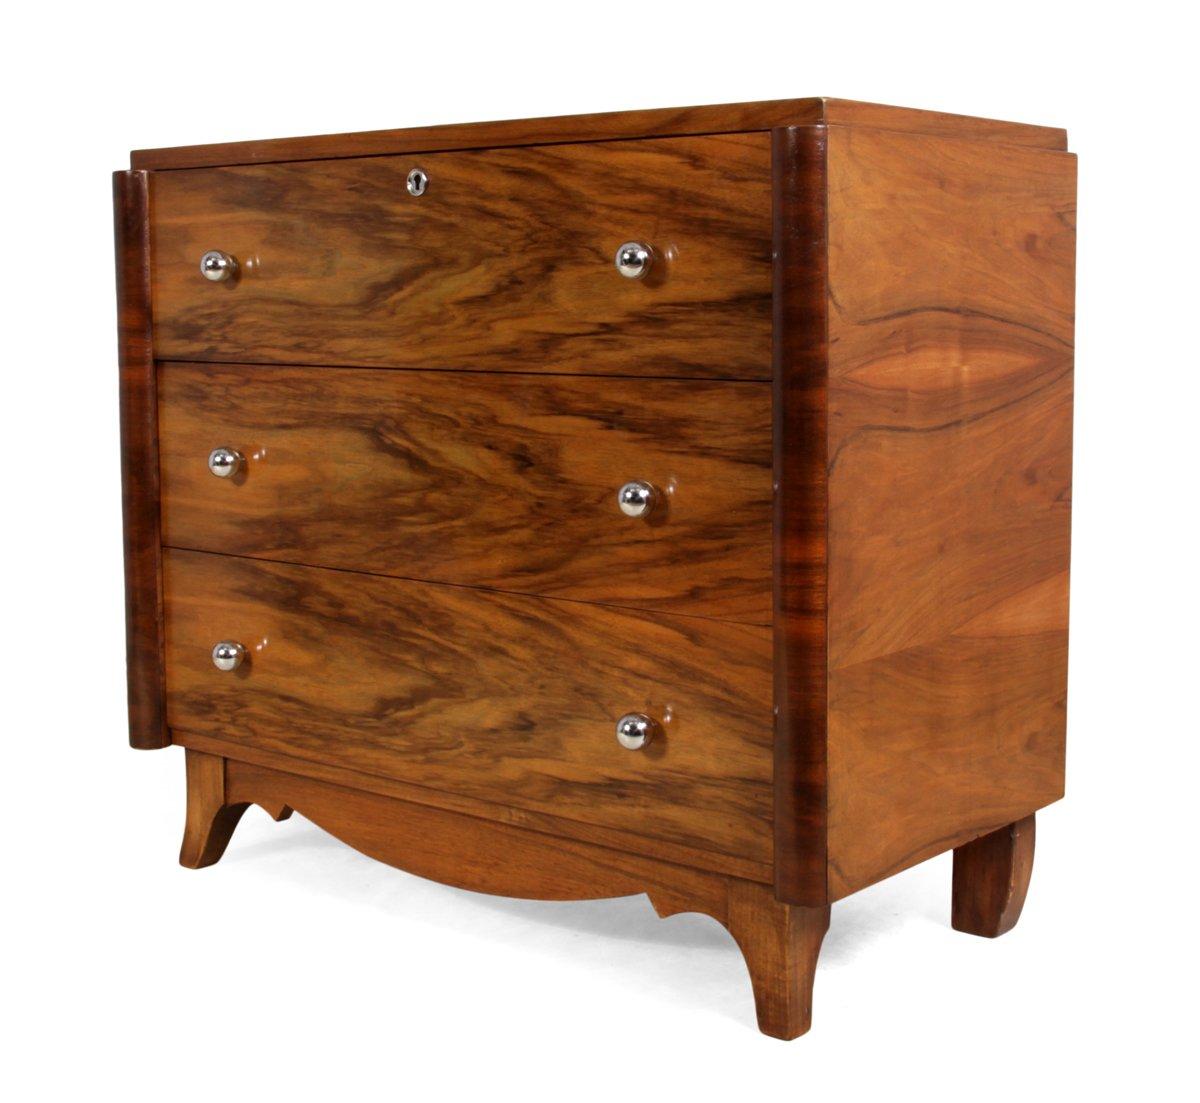 commode art d co en noyer france 1930s en vente sur pamono. Black Bedroom Furniture Sets. Home Design Ideas